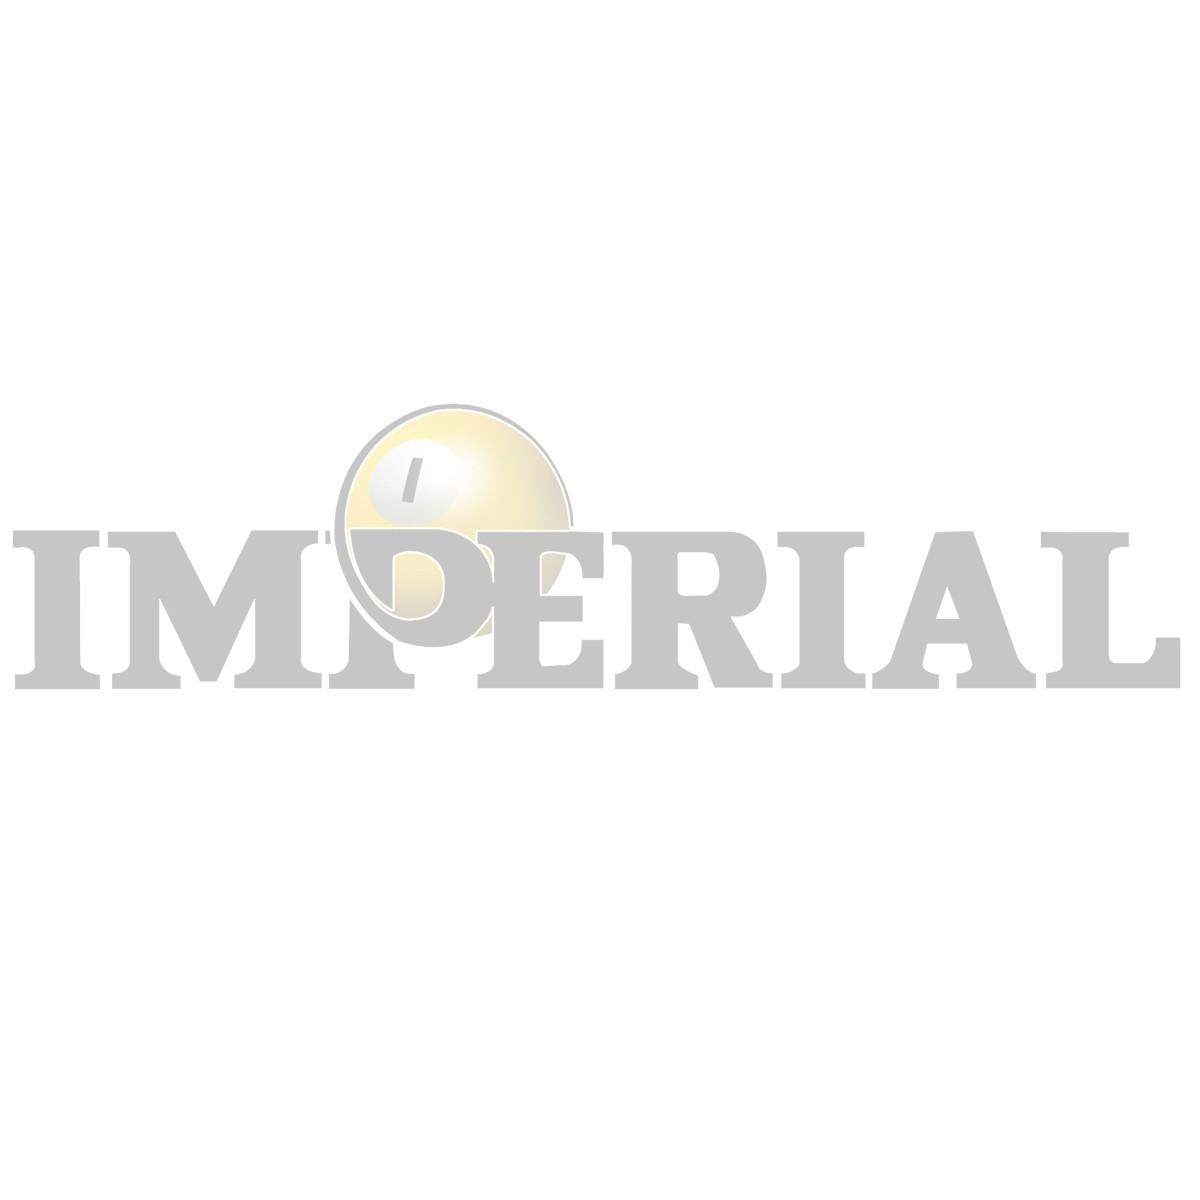 Dallas Cowboys Home vs. Away Billiard Ball Set